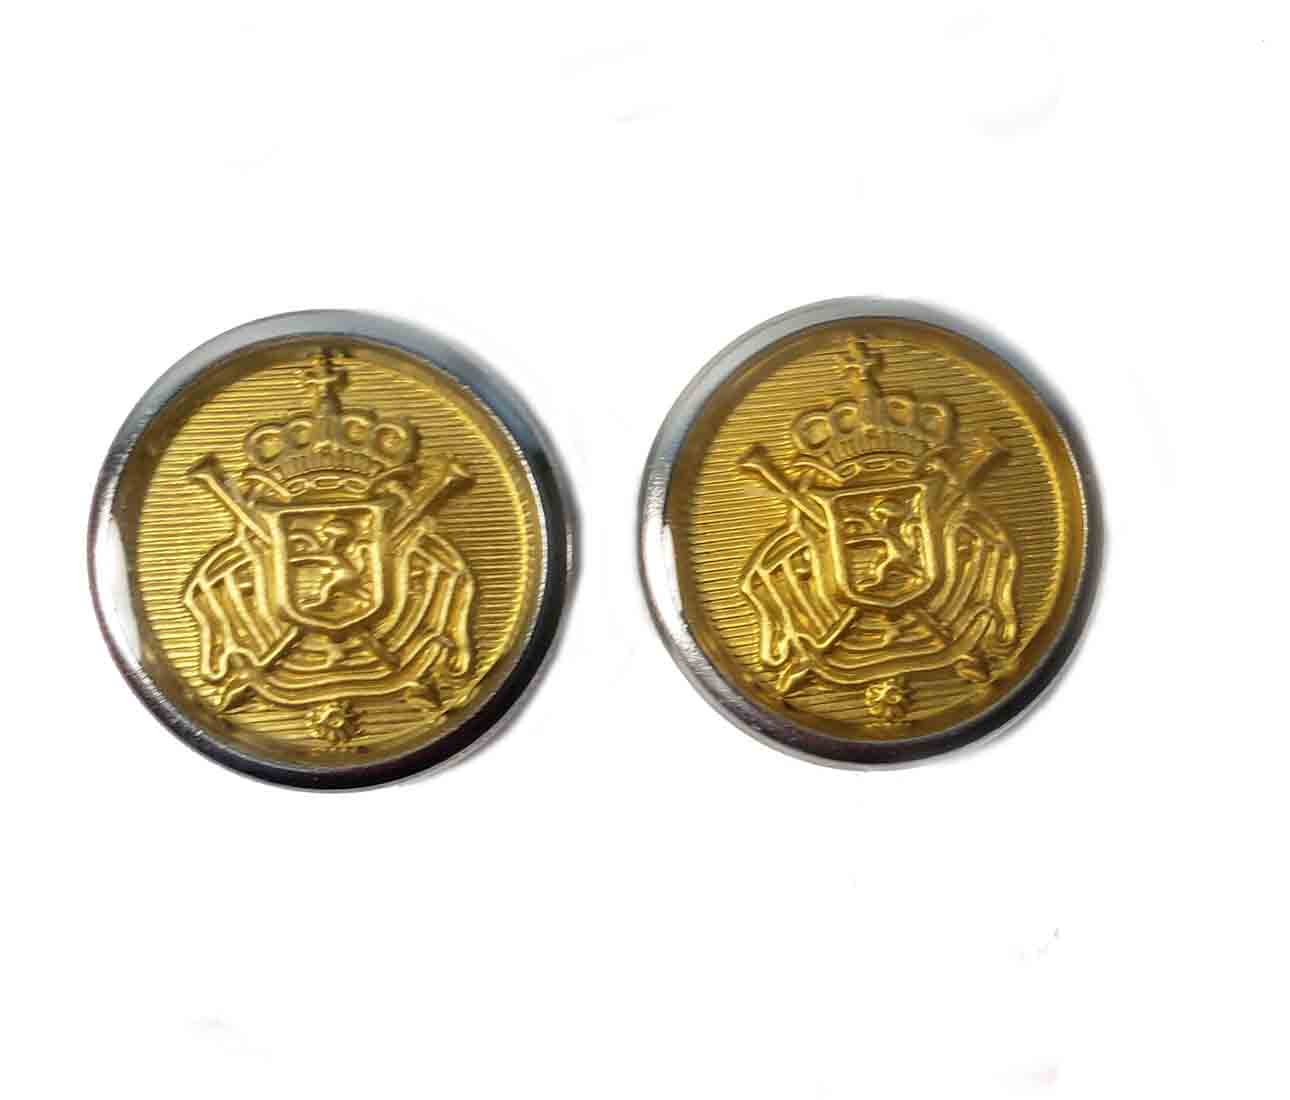 Two Belgian Crest Blazer Buttons Gold Silver Shank Men's